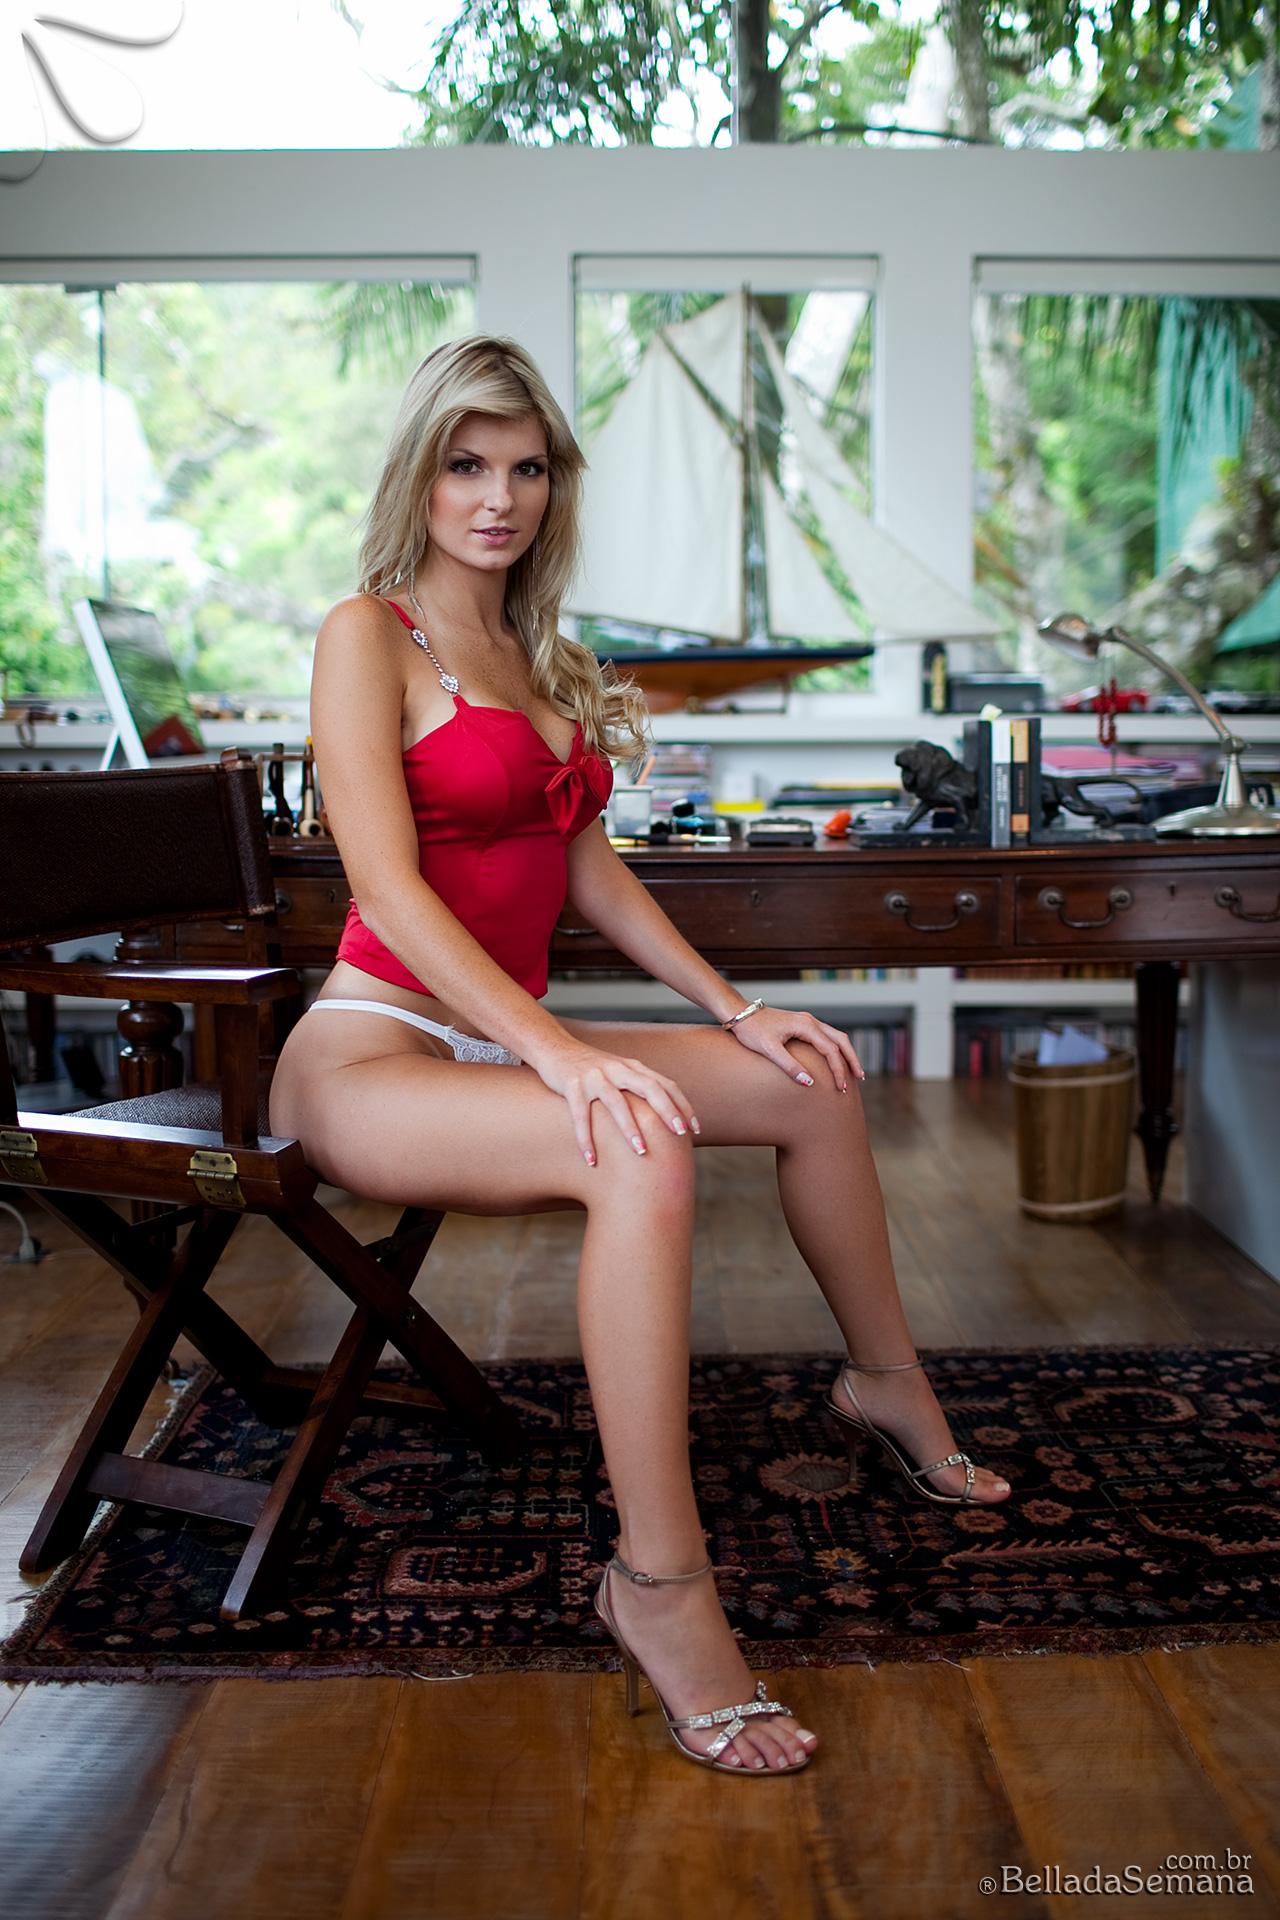 angelica-woicichoski-tan-lines-blonde-brazilian-bella-da-semana-02